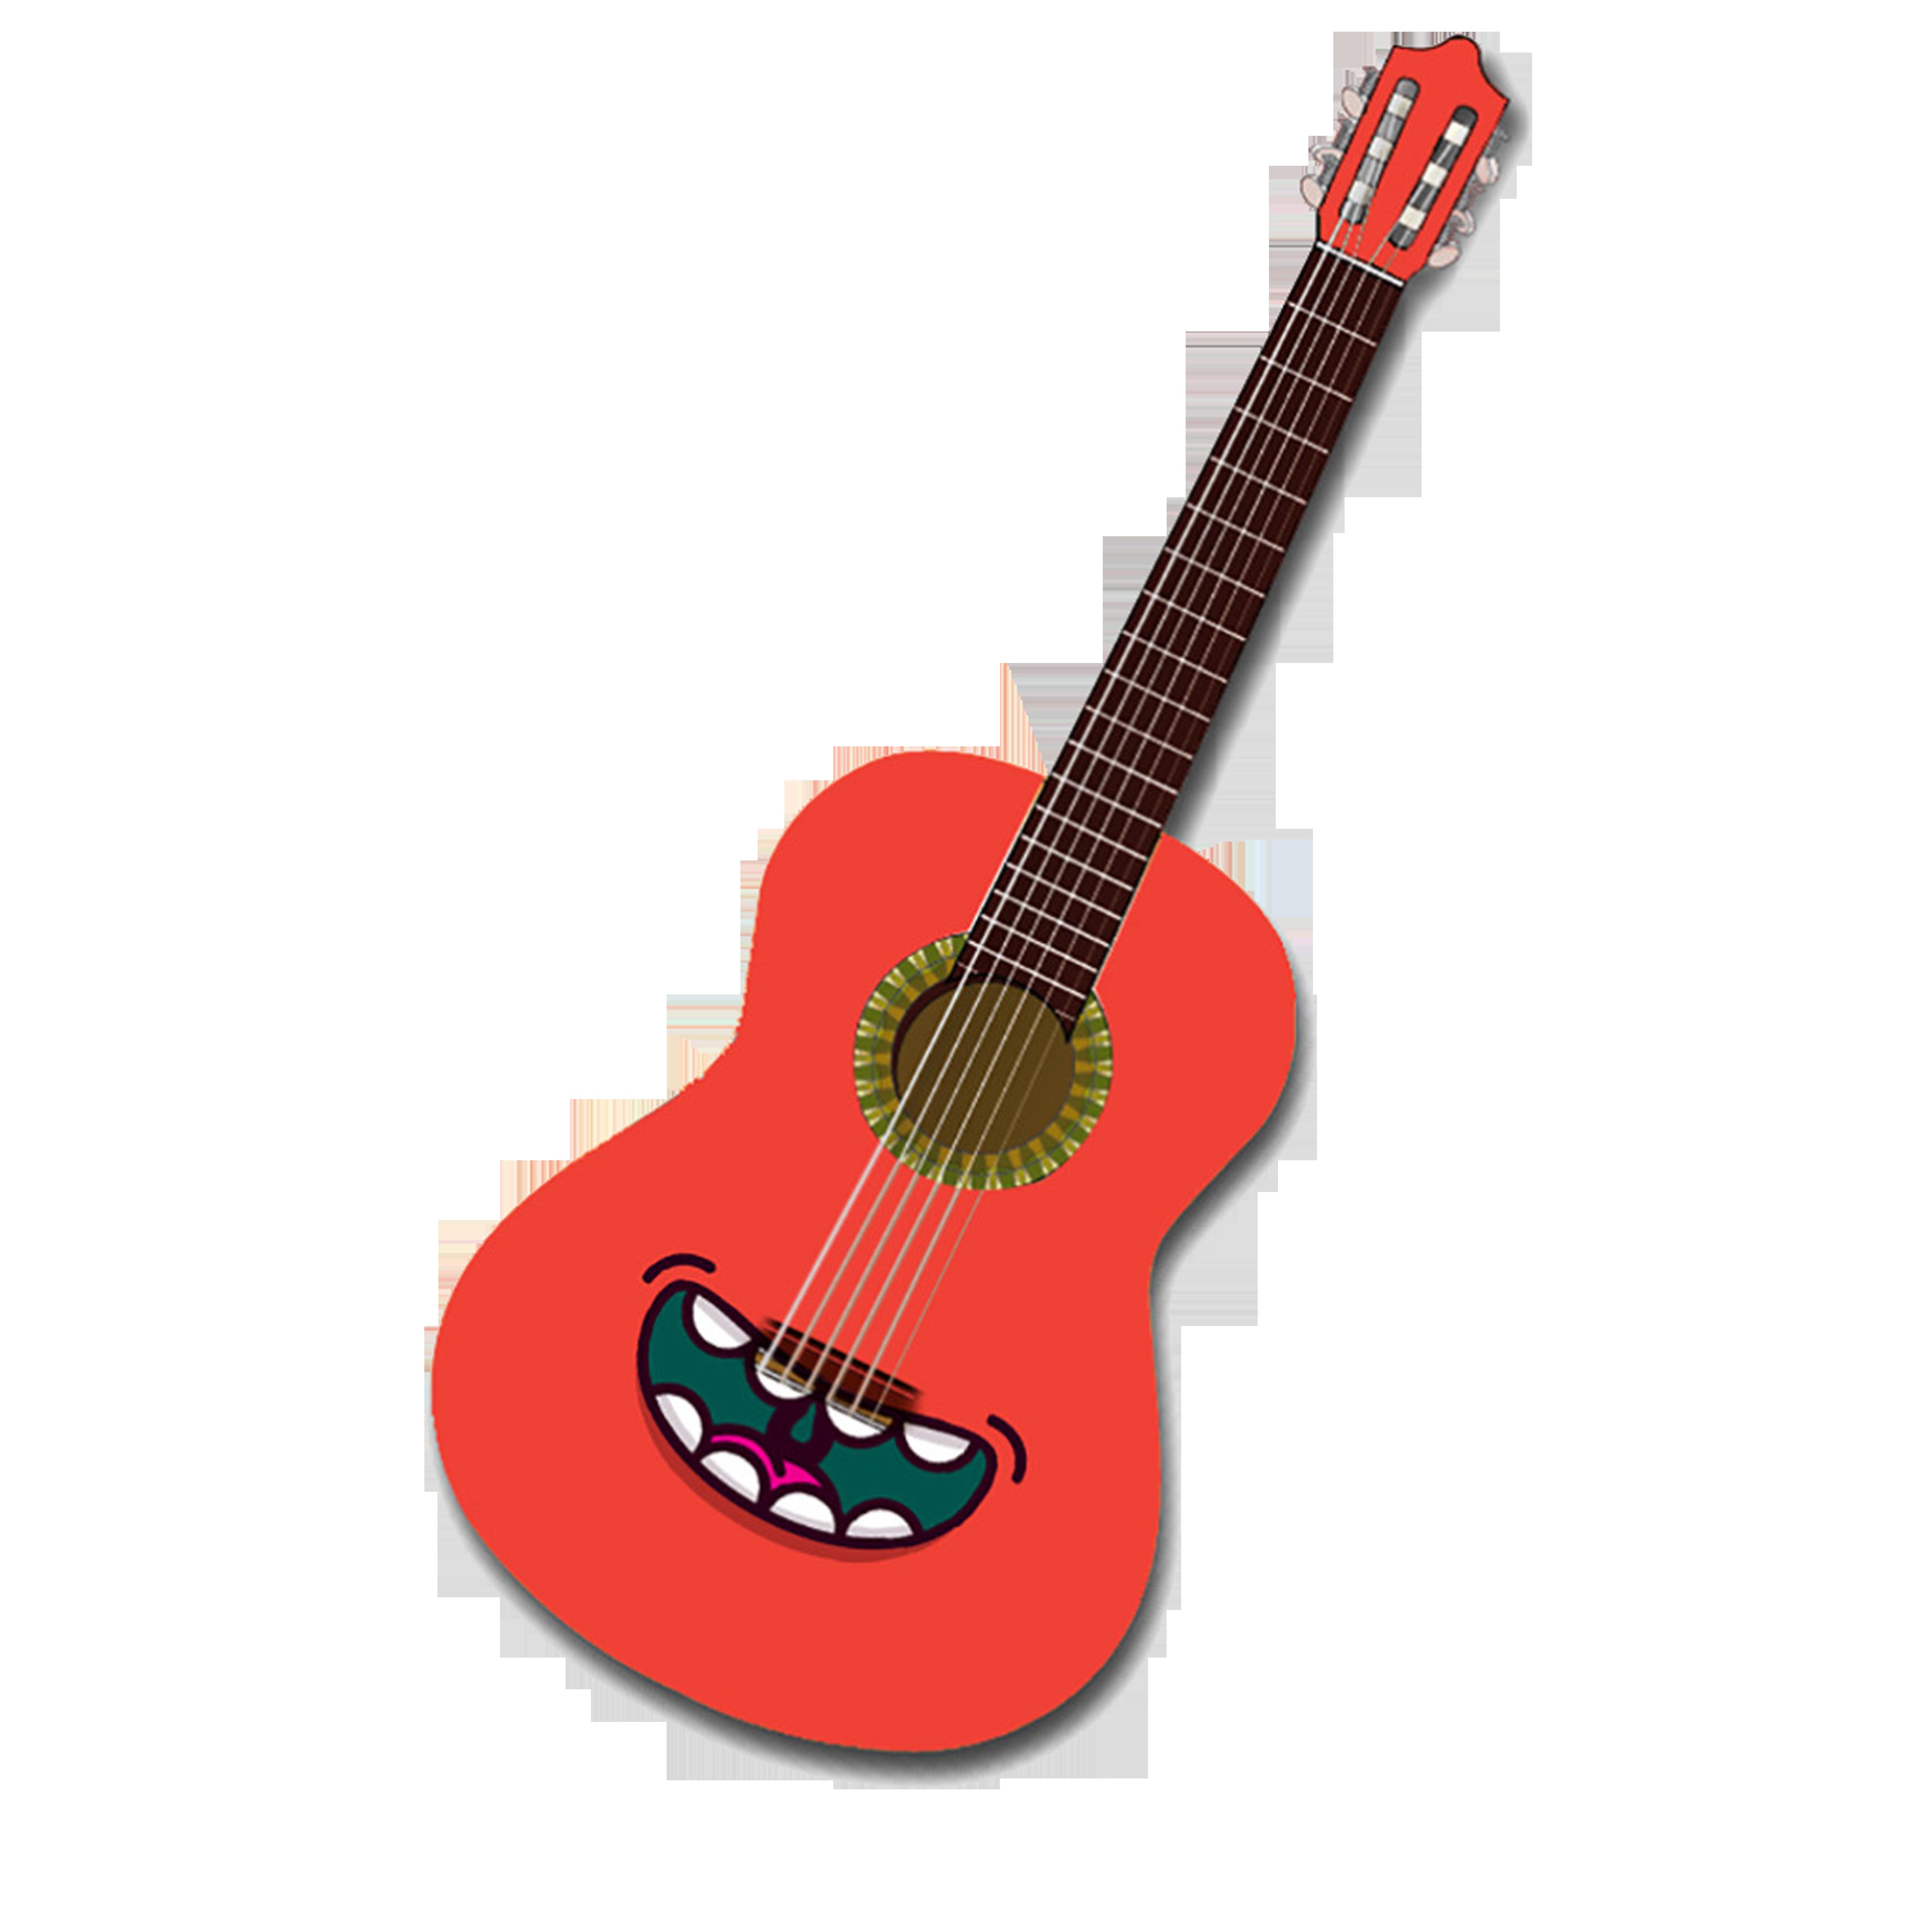 Guitar Cartoon Creative Hq Image Free Png Guitar Images Guitar Valve Trombone